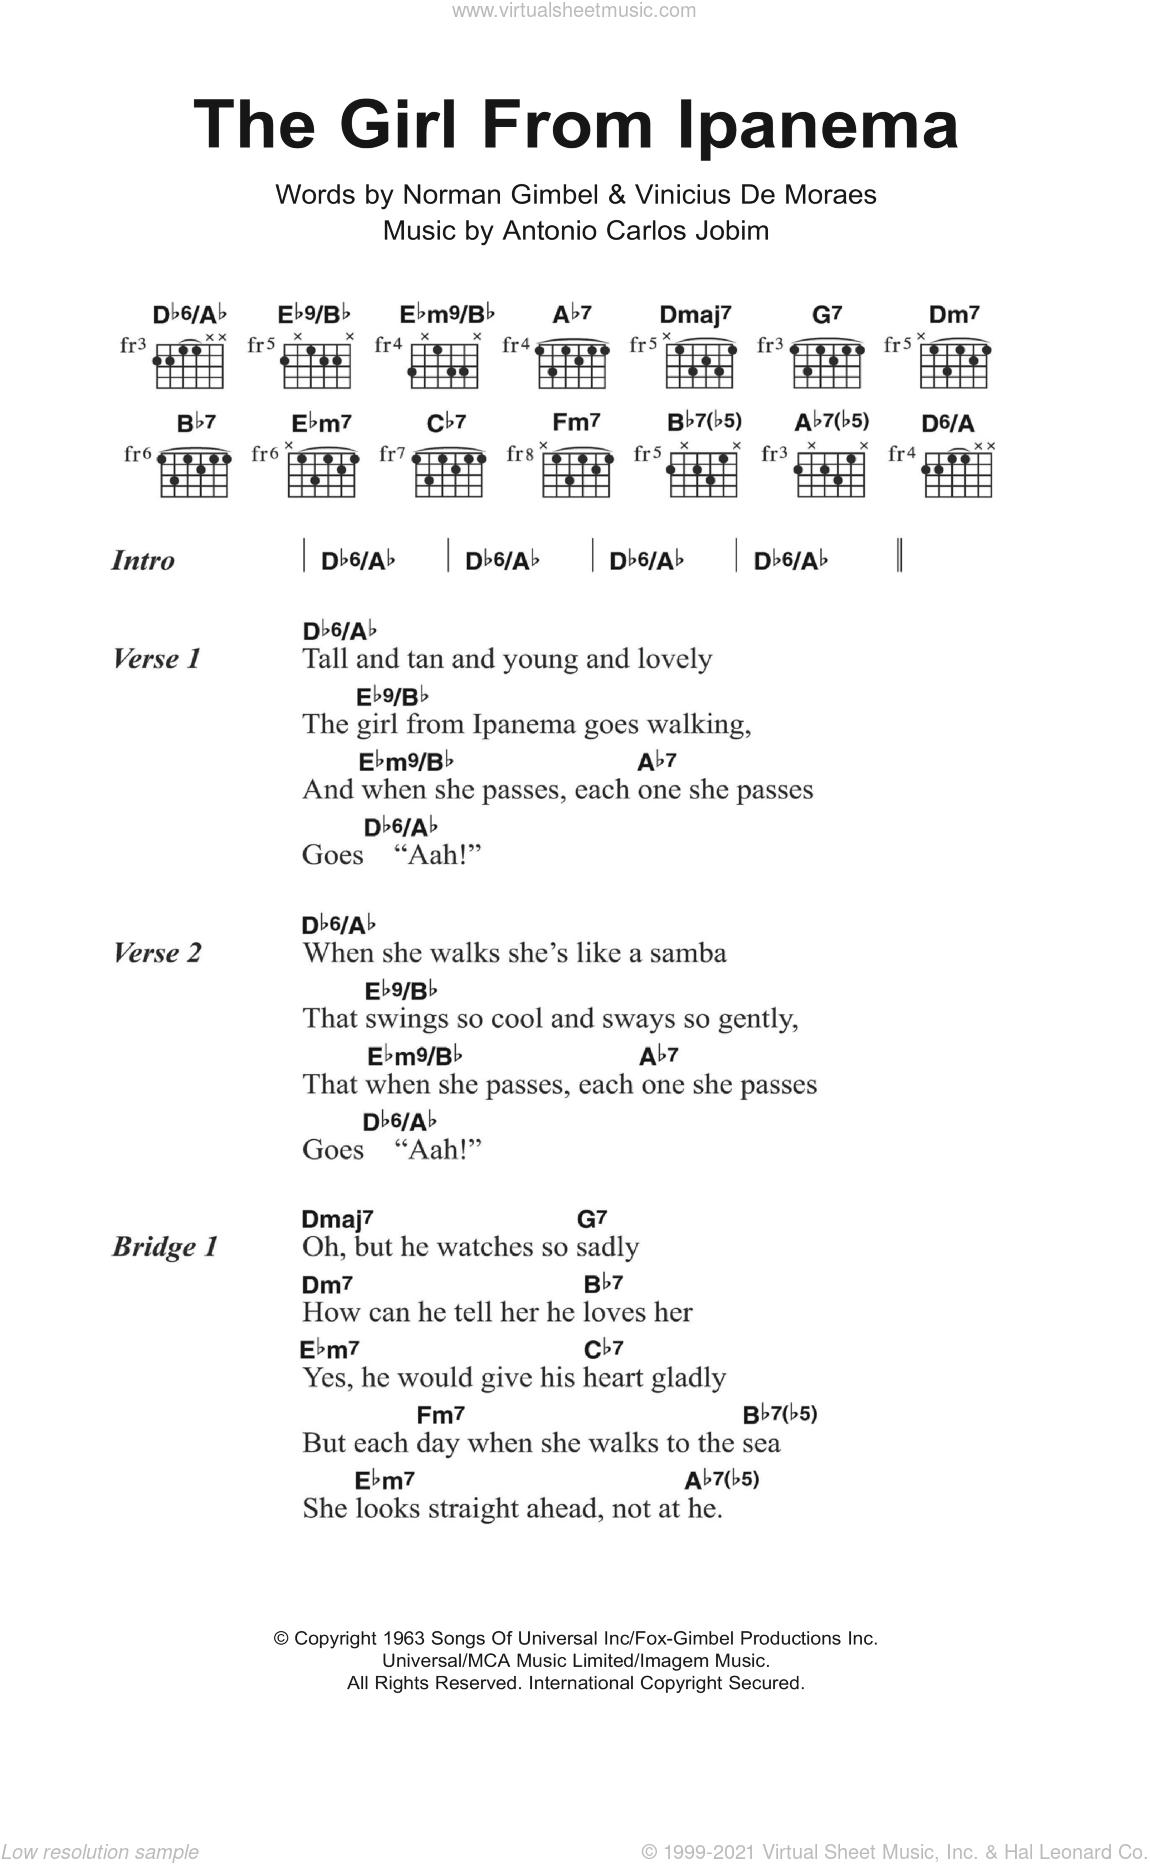 The Girl From Ipanema (featuring Astrud Gilberto) sheet music for guitar (chords) by Joao Gilberto, Astrud Gilberto, Stan Getz, Antonio Carlos Jobim, Norman Gimbel and Vinicius de Moraes, intermediate skill level